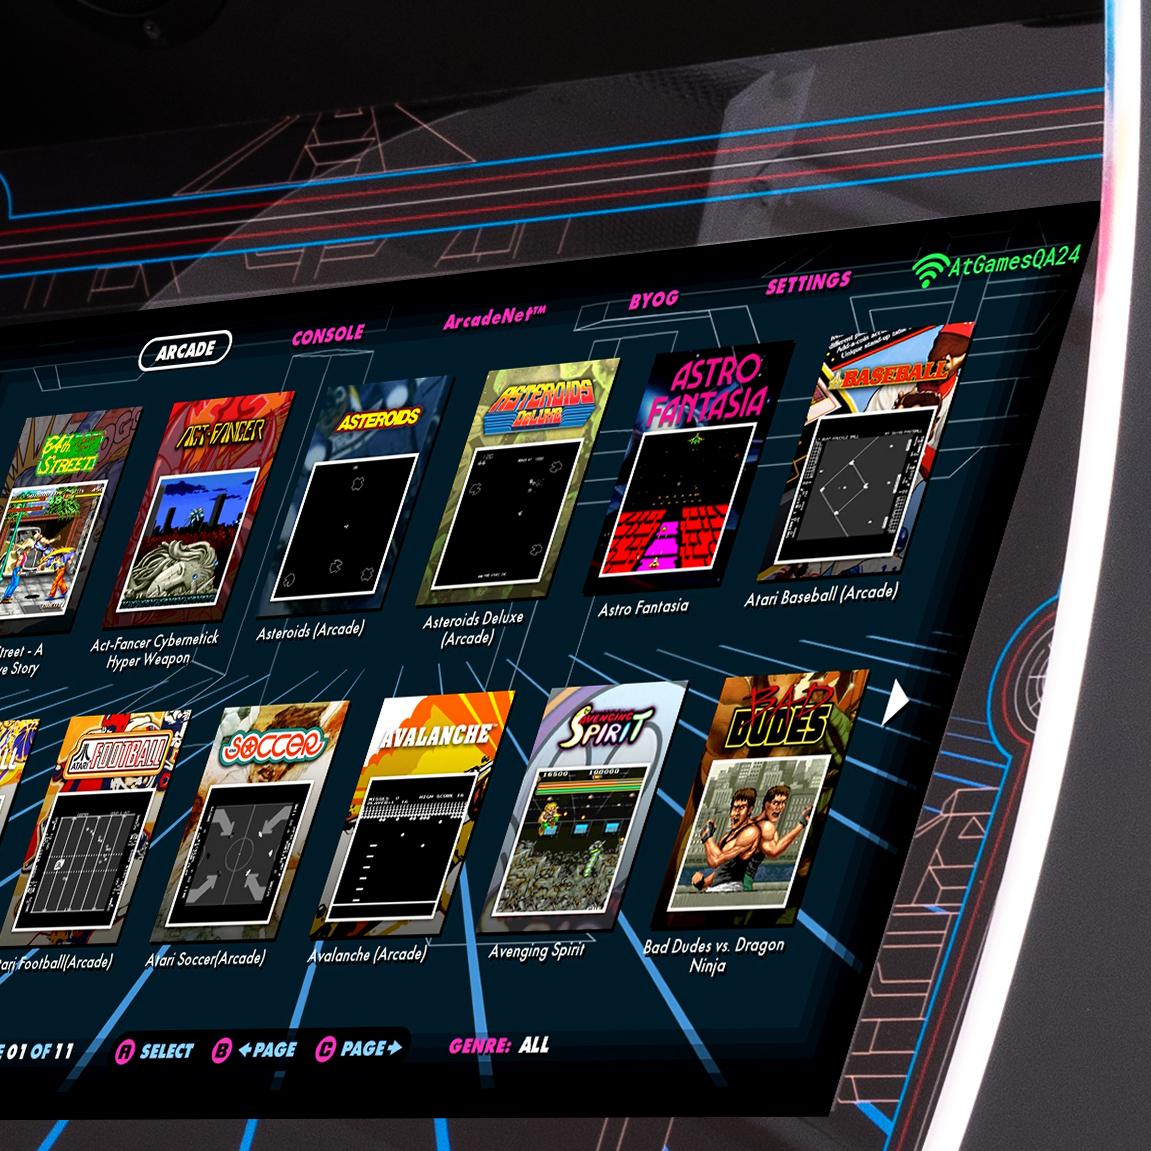 Legends Ultimate Arcade Cabinet Includes 133 Atari Games